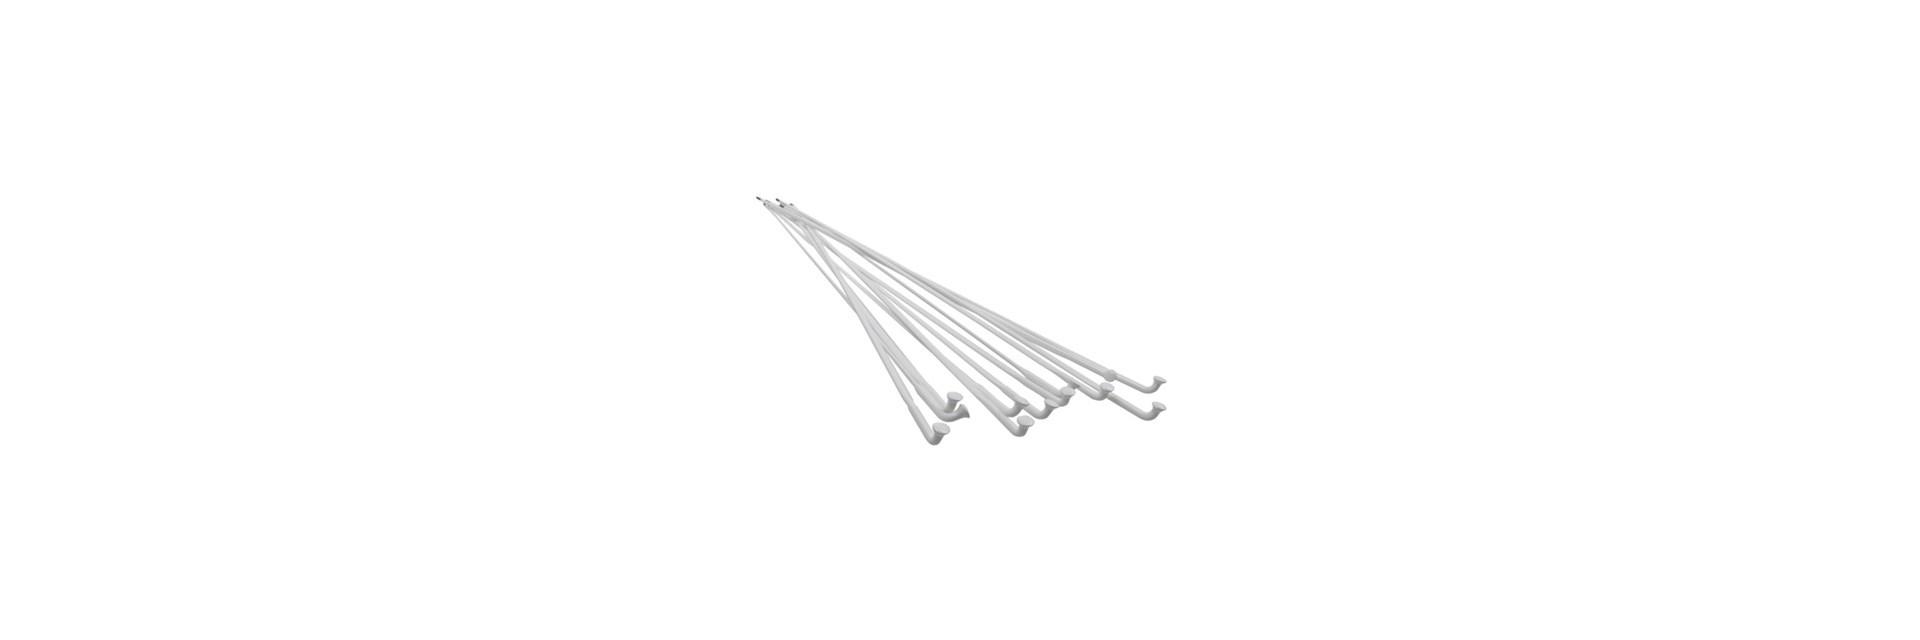 Raio Aerodinamico Flat 2.0 Branco - Cabeça Curva